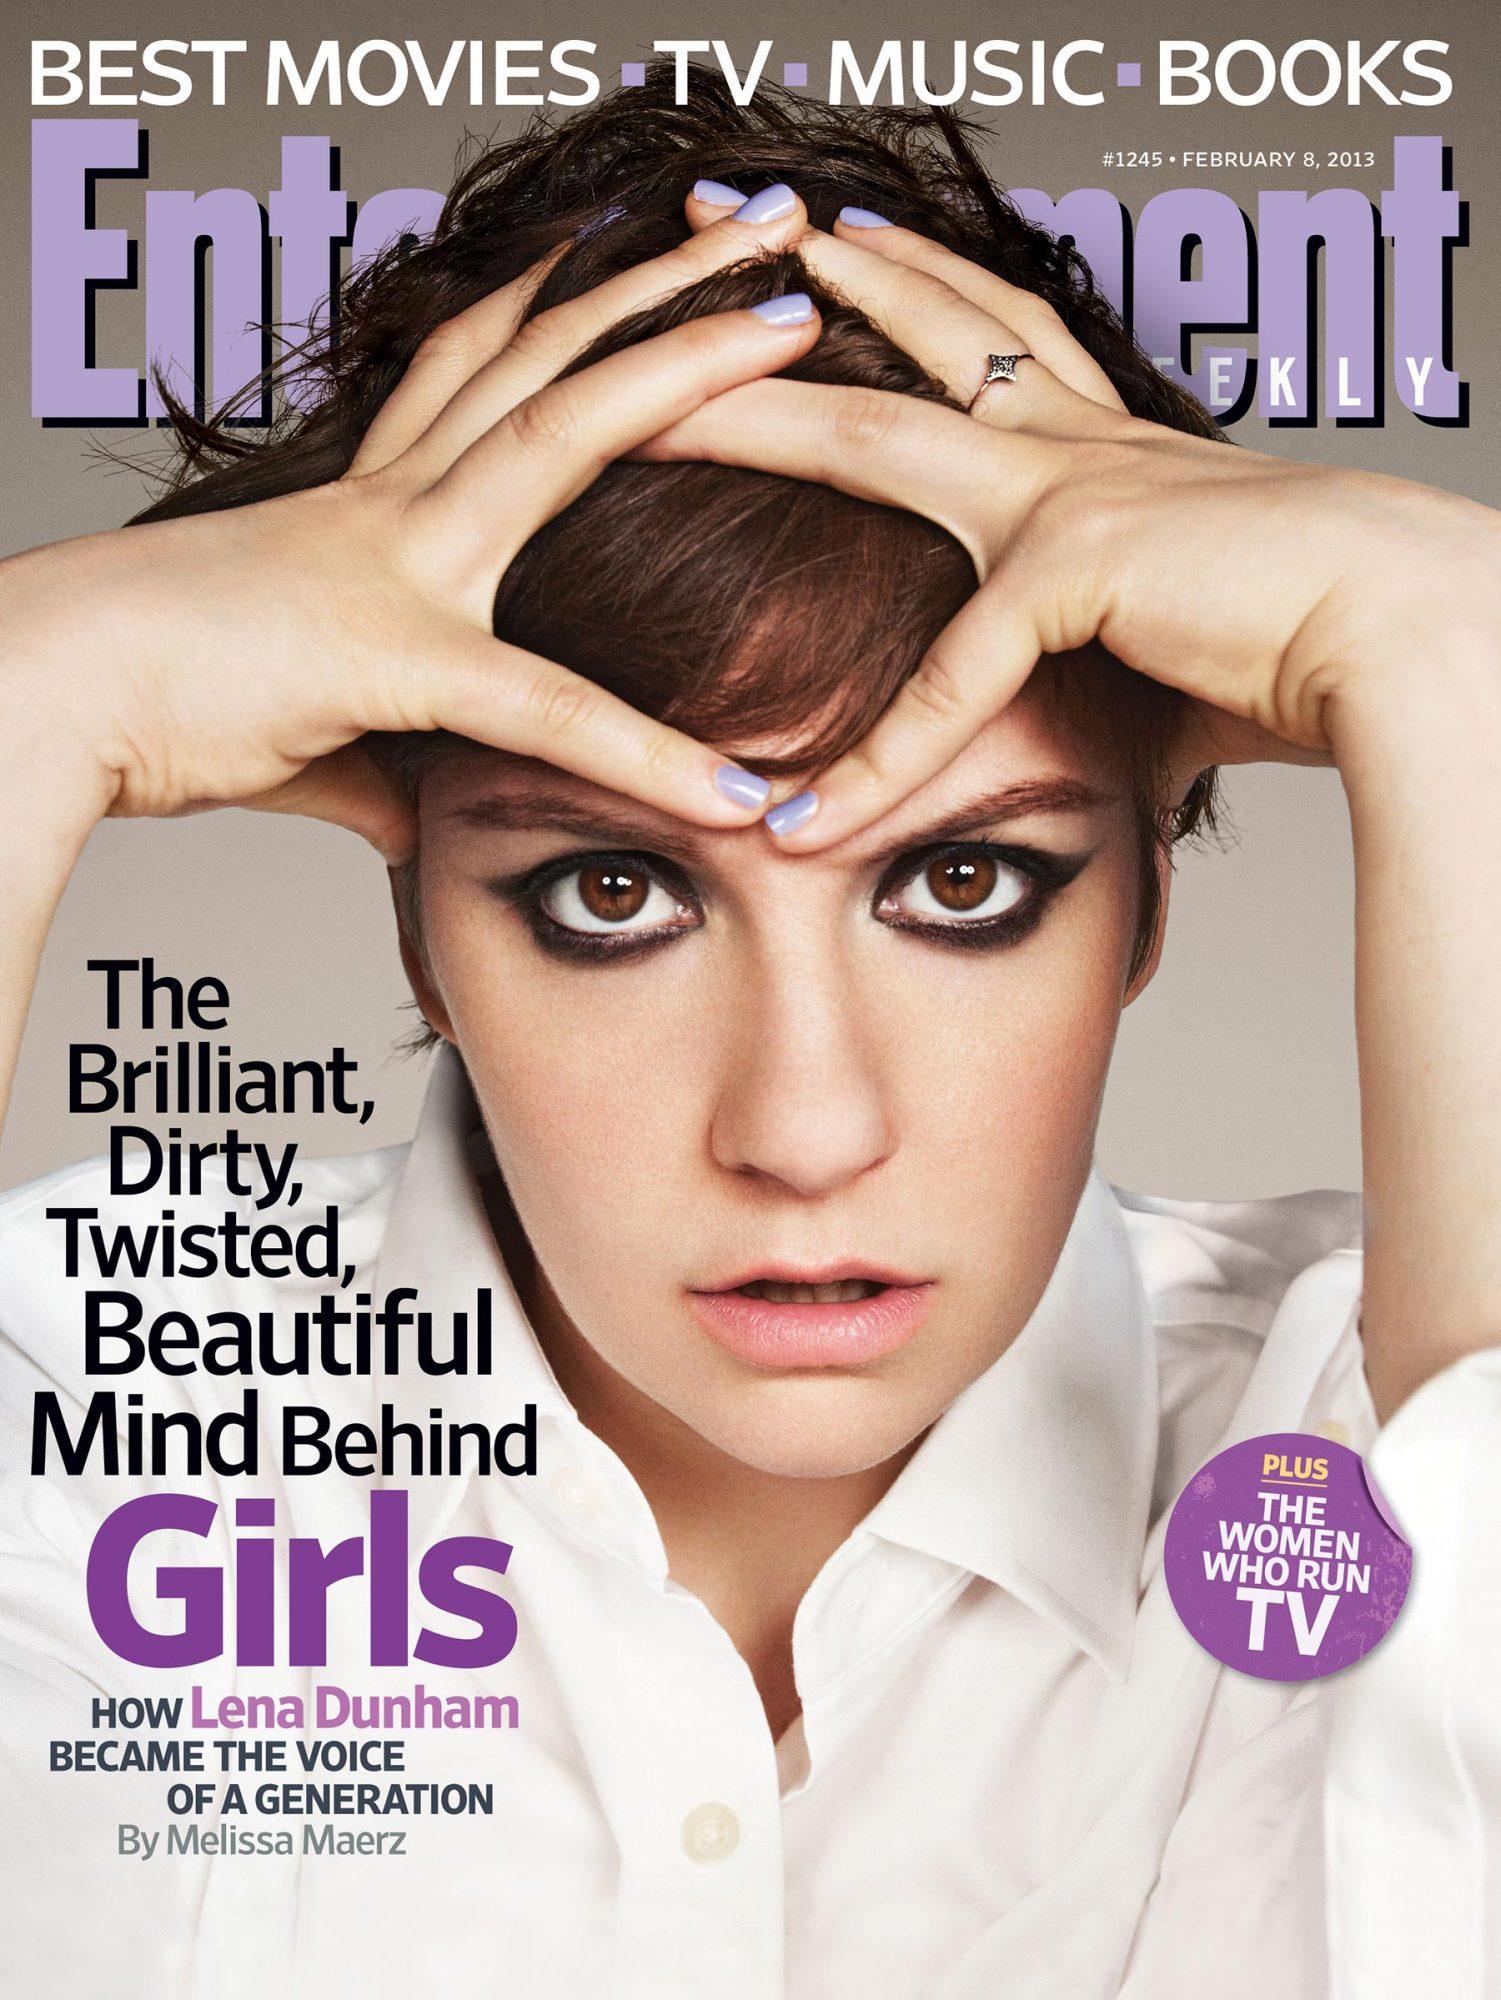 Entertainment WeeklyLena DunhamFebruary 8, 2013# 1245